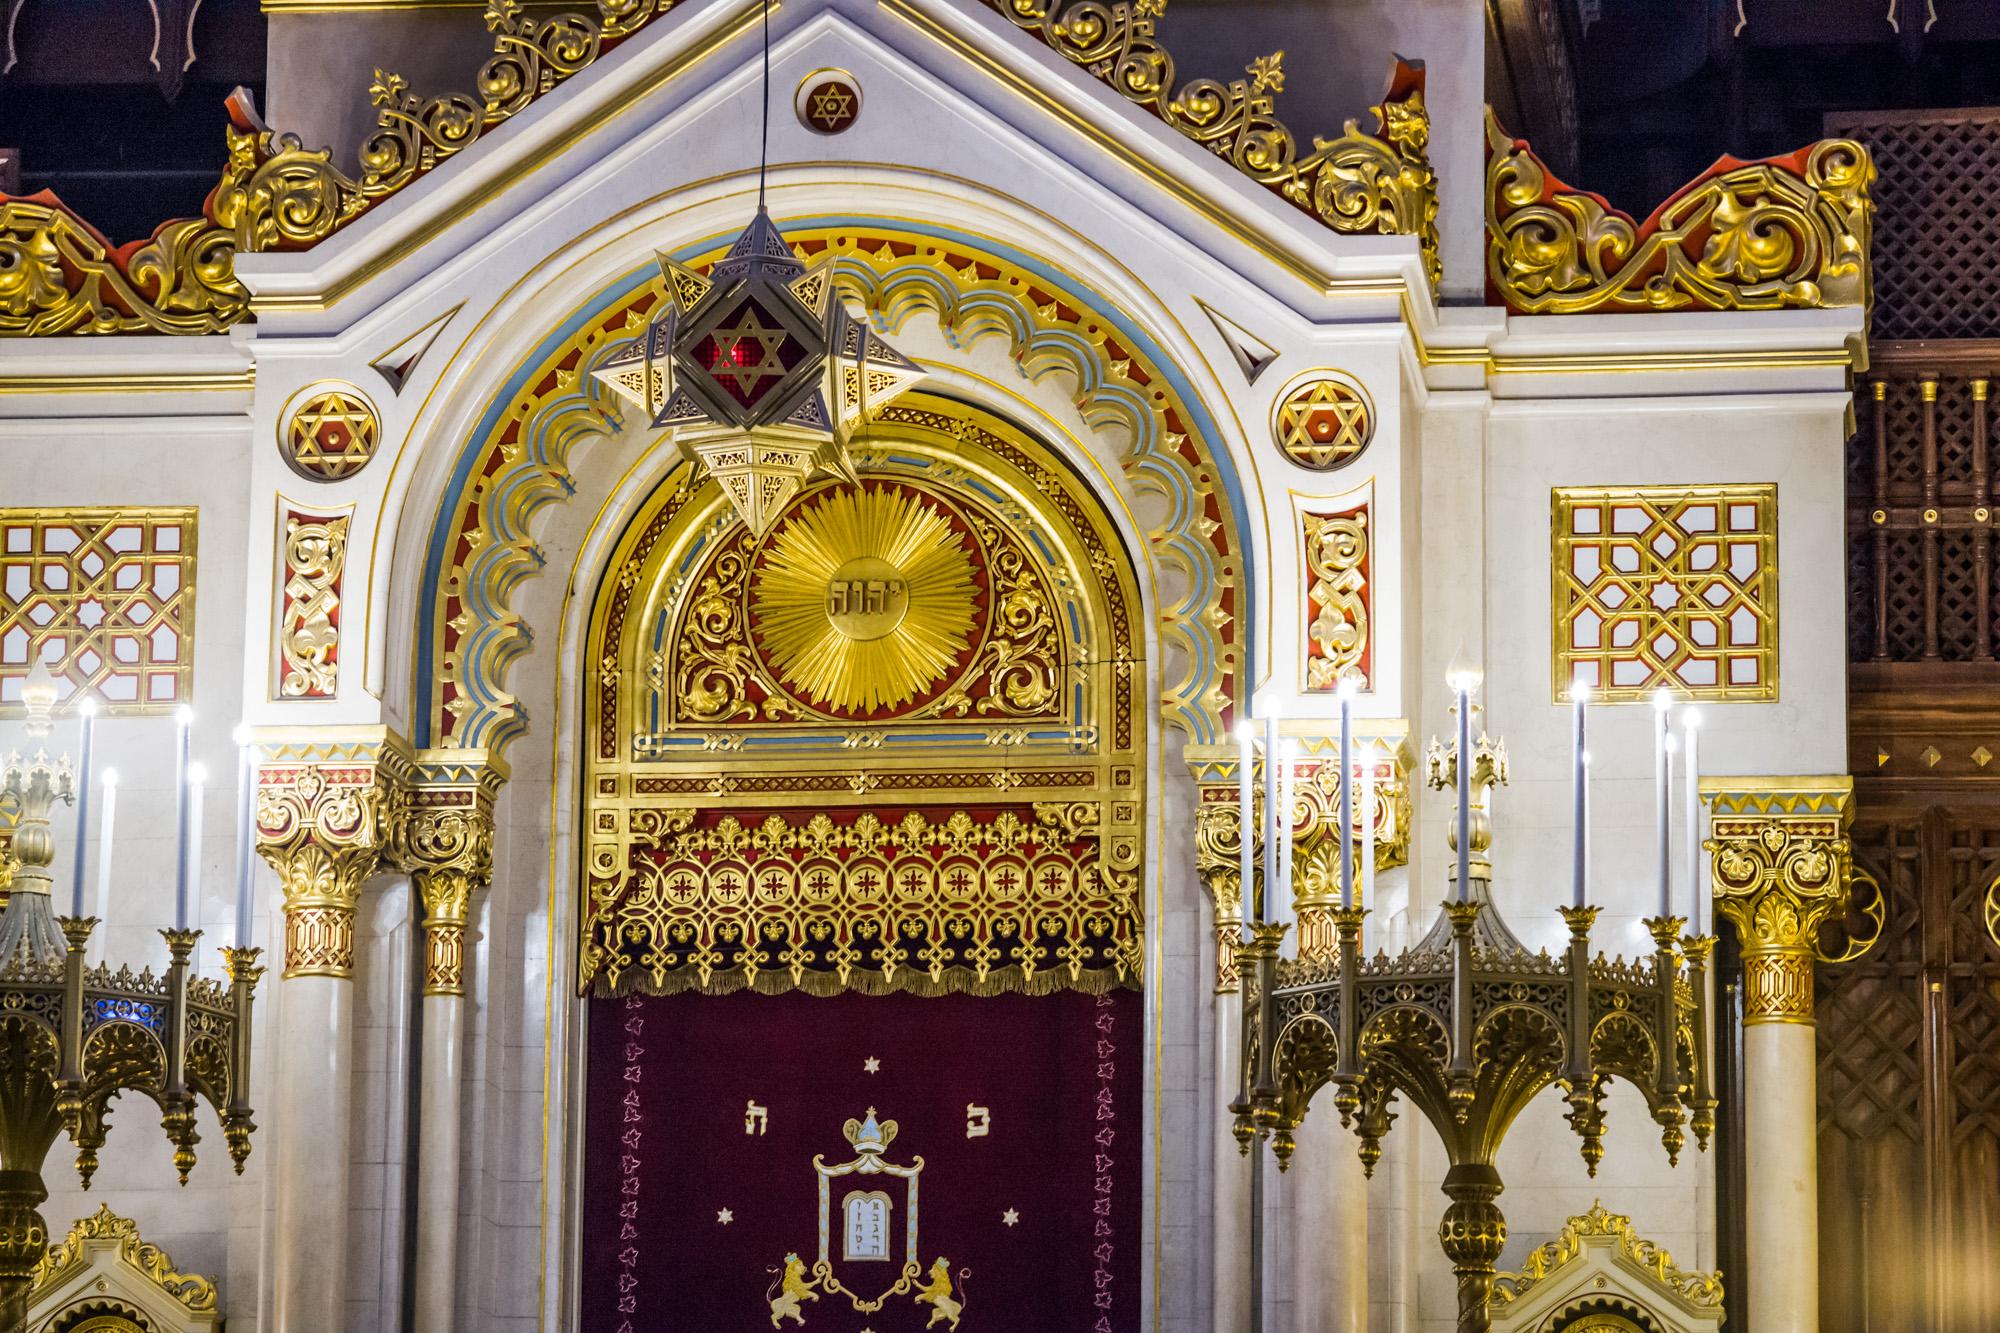 The Ark of the Torah